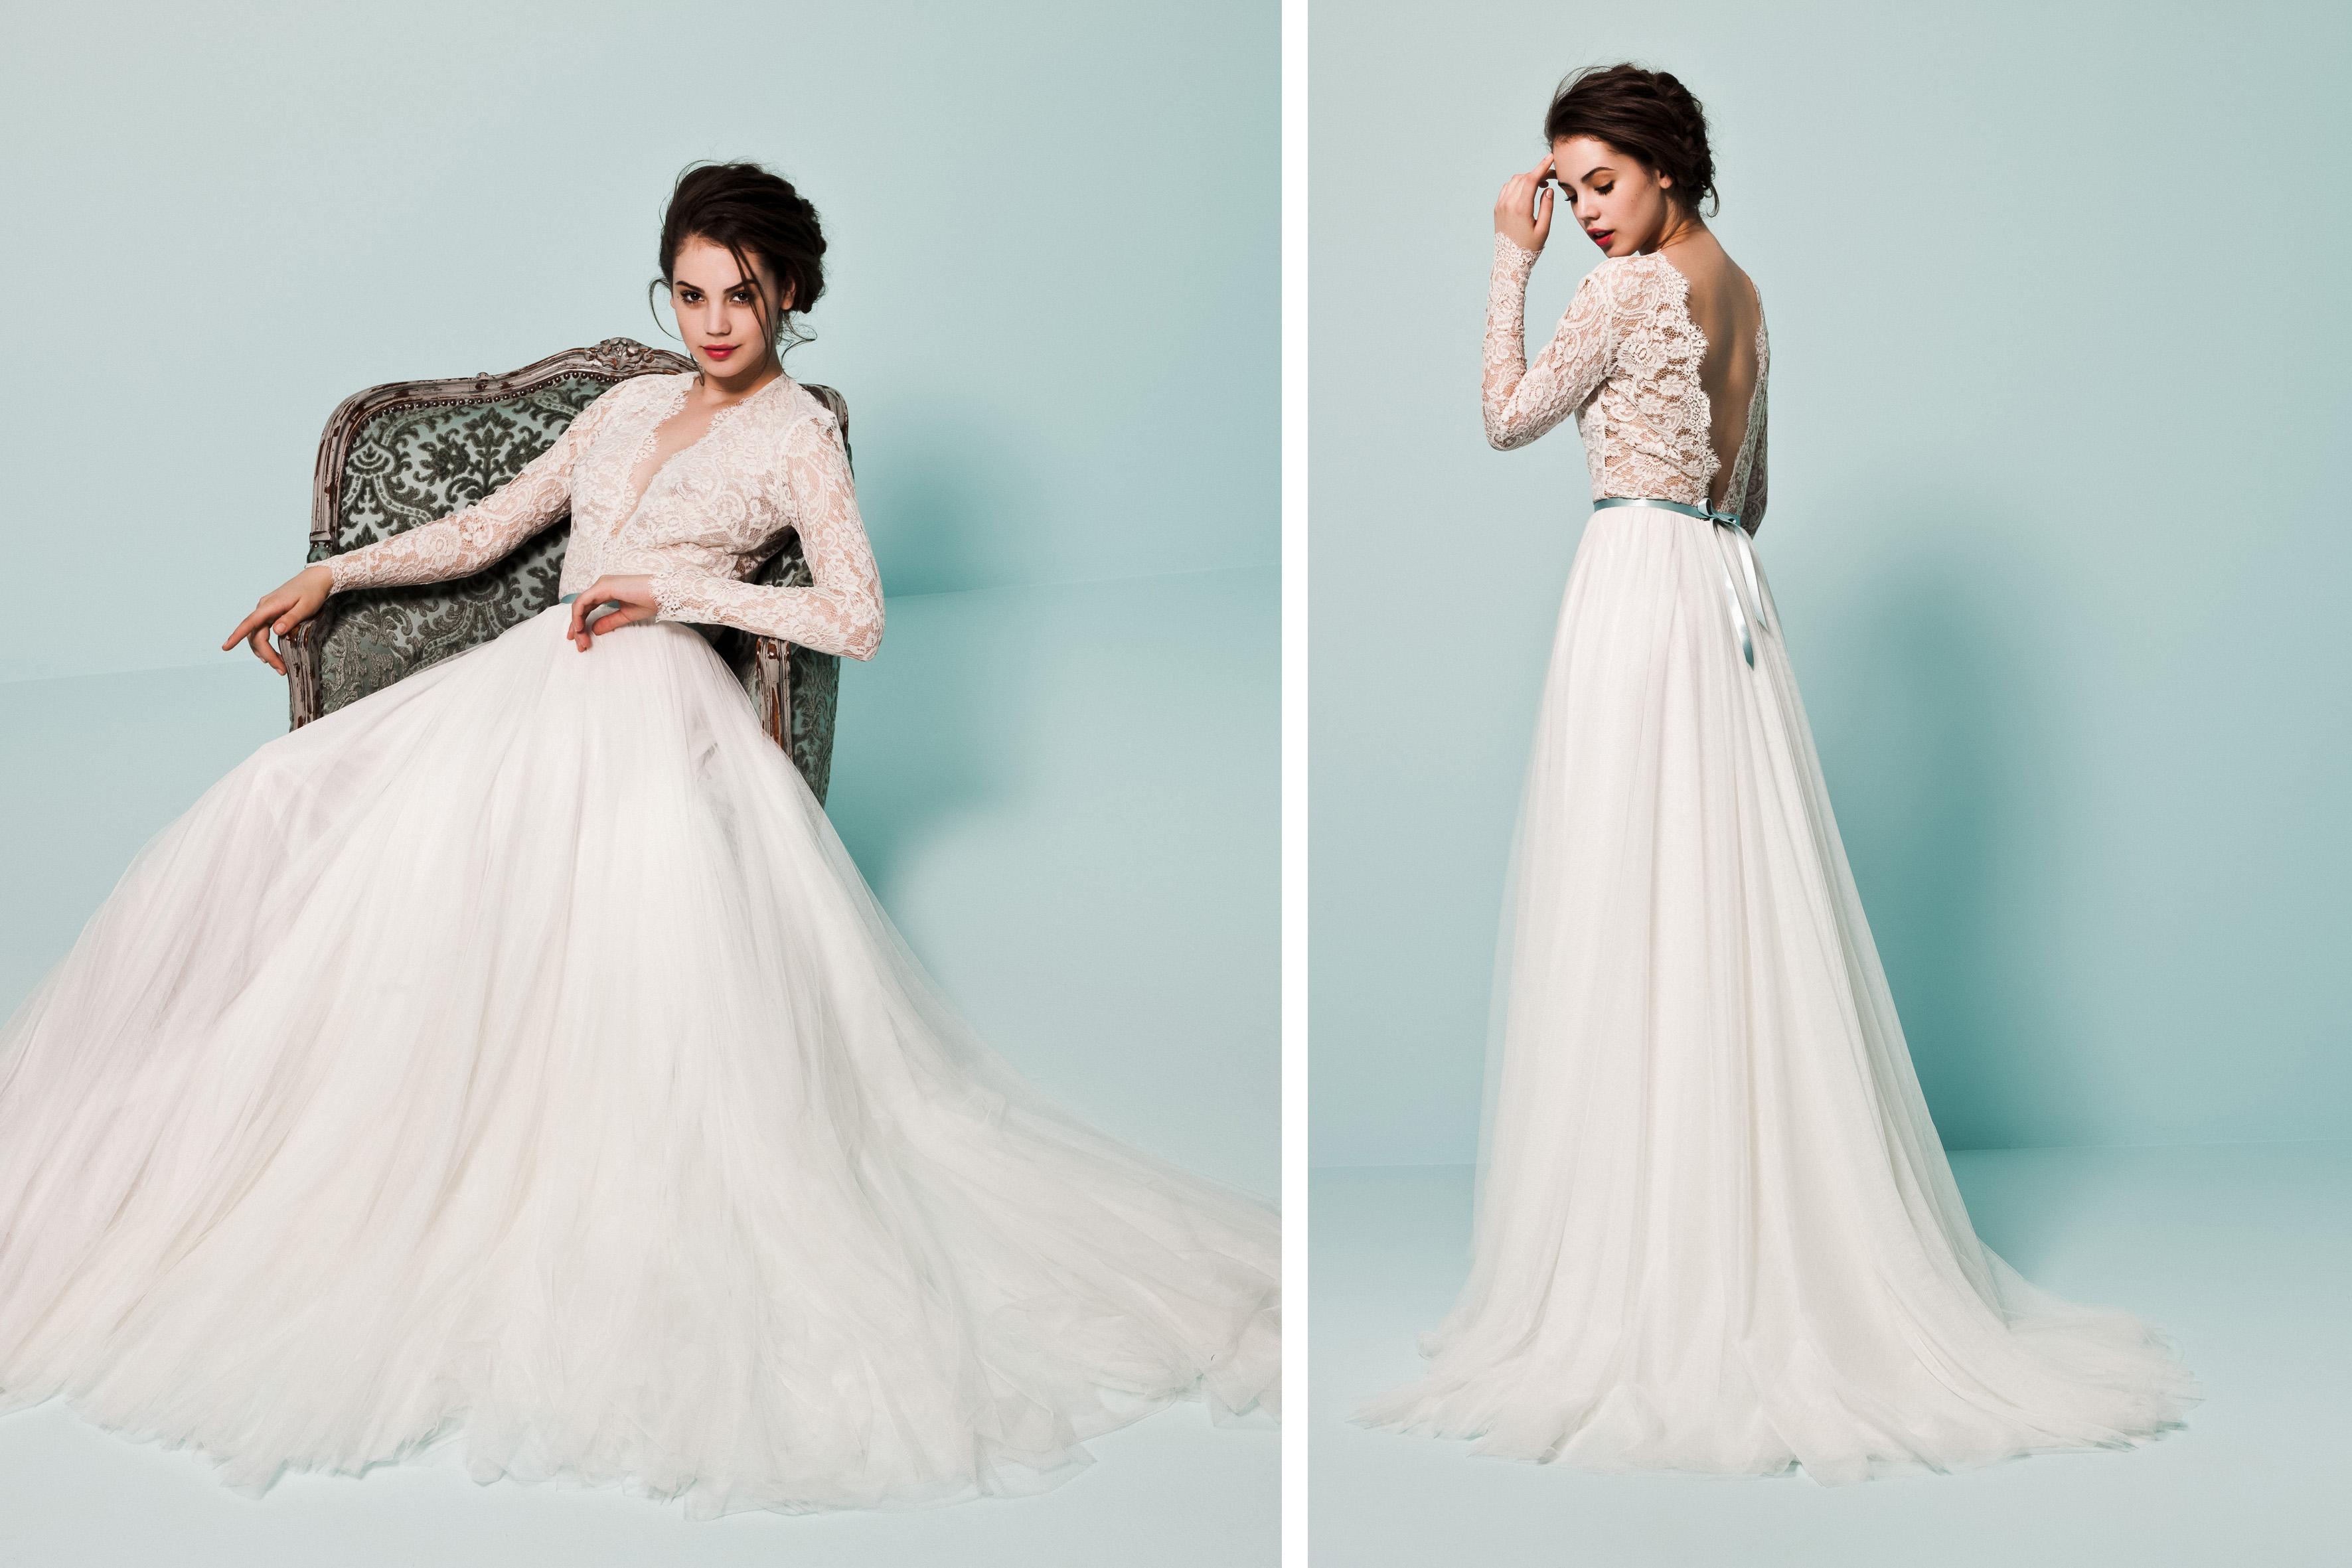 The Wedding – Dress Inspiration – Maybe You Like